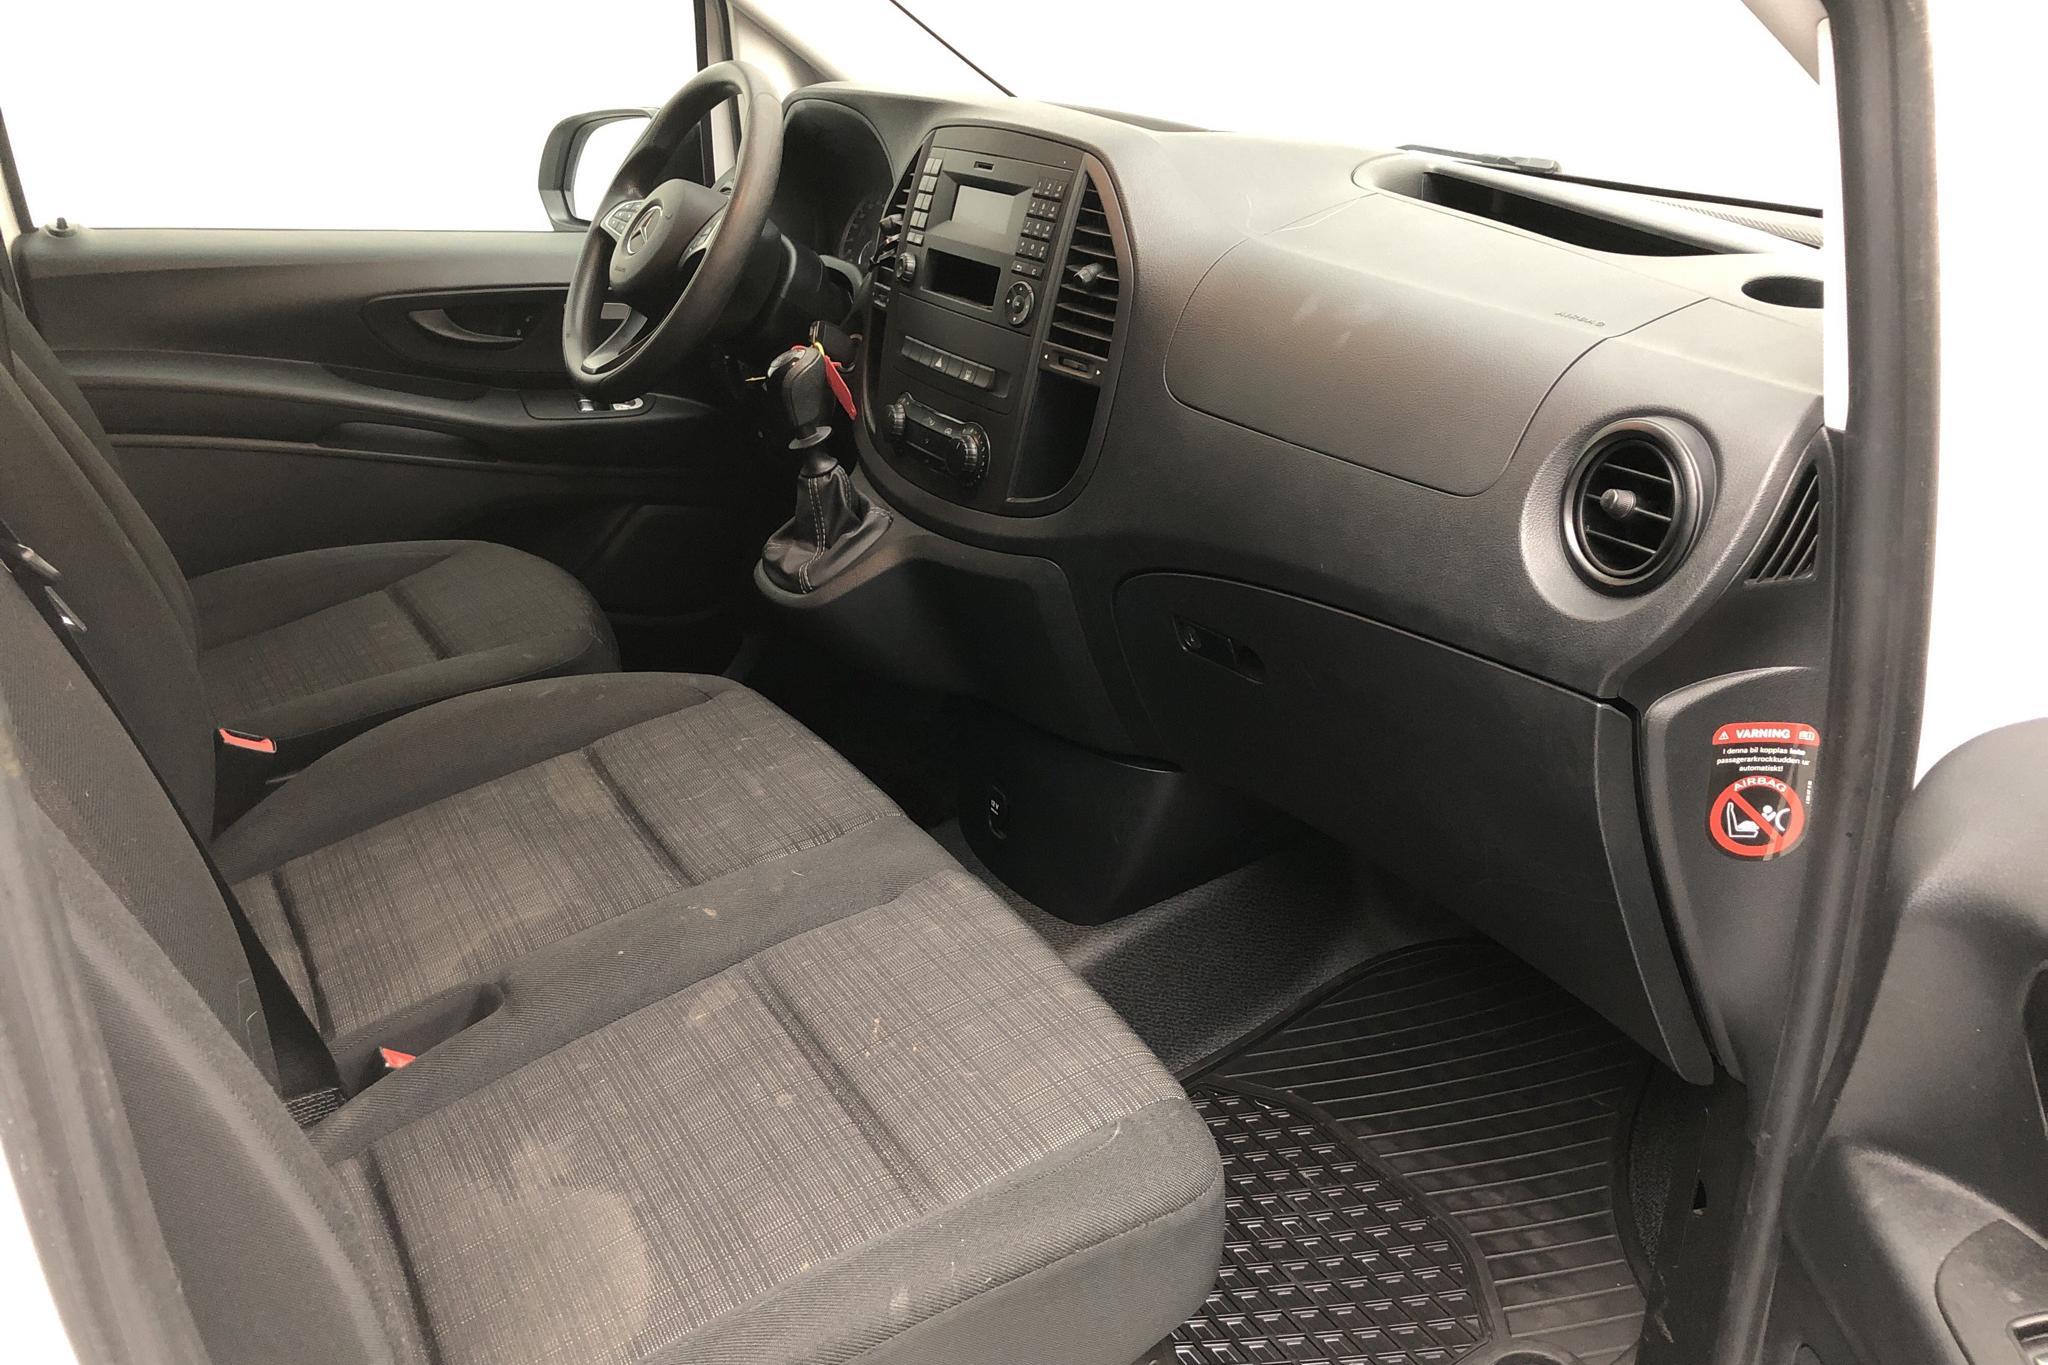 Mercedes Vito 111 CDI W640 (114hk) - 3 842 mil - Manuell - vit - 2018